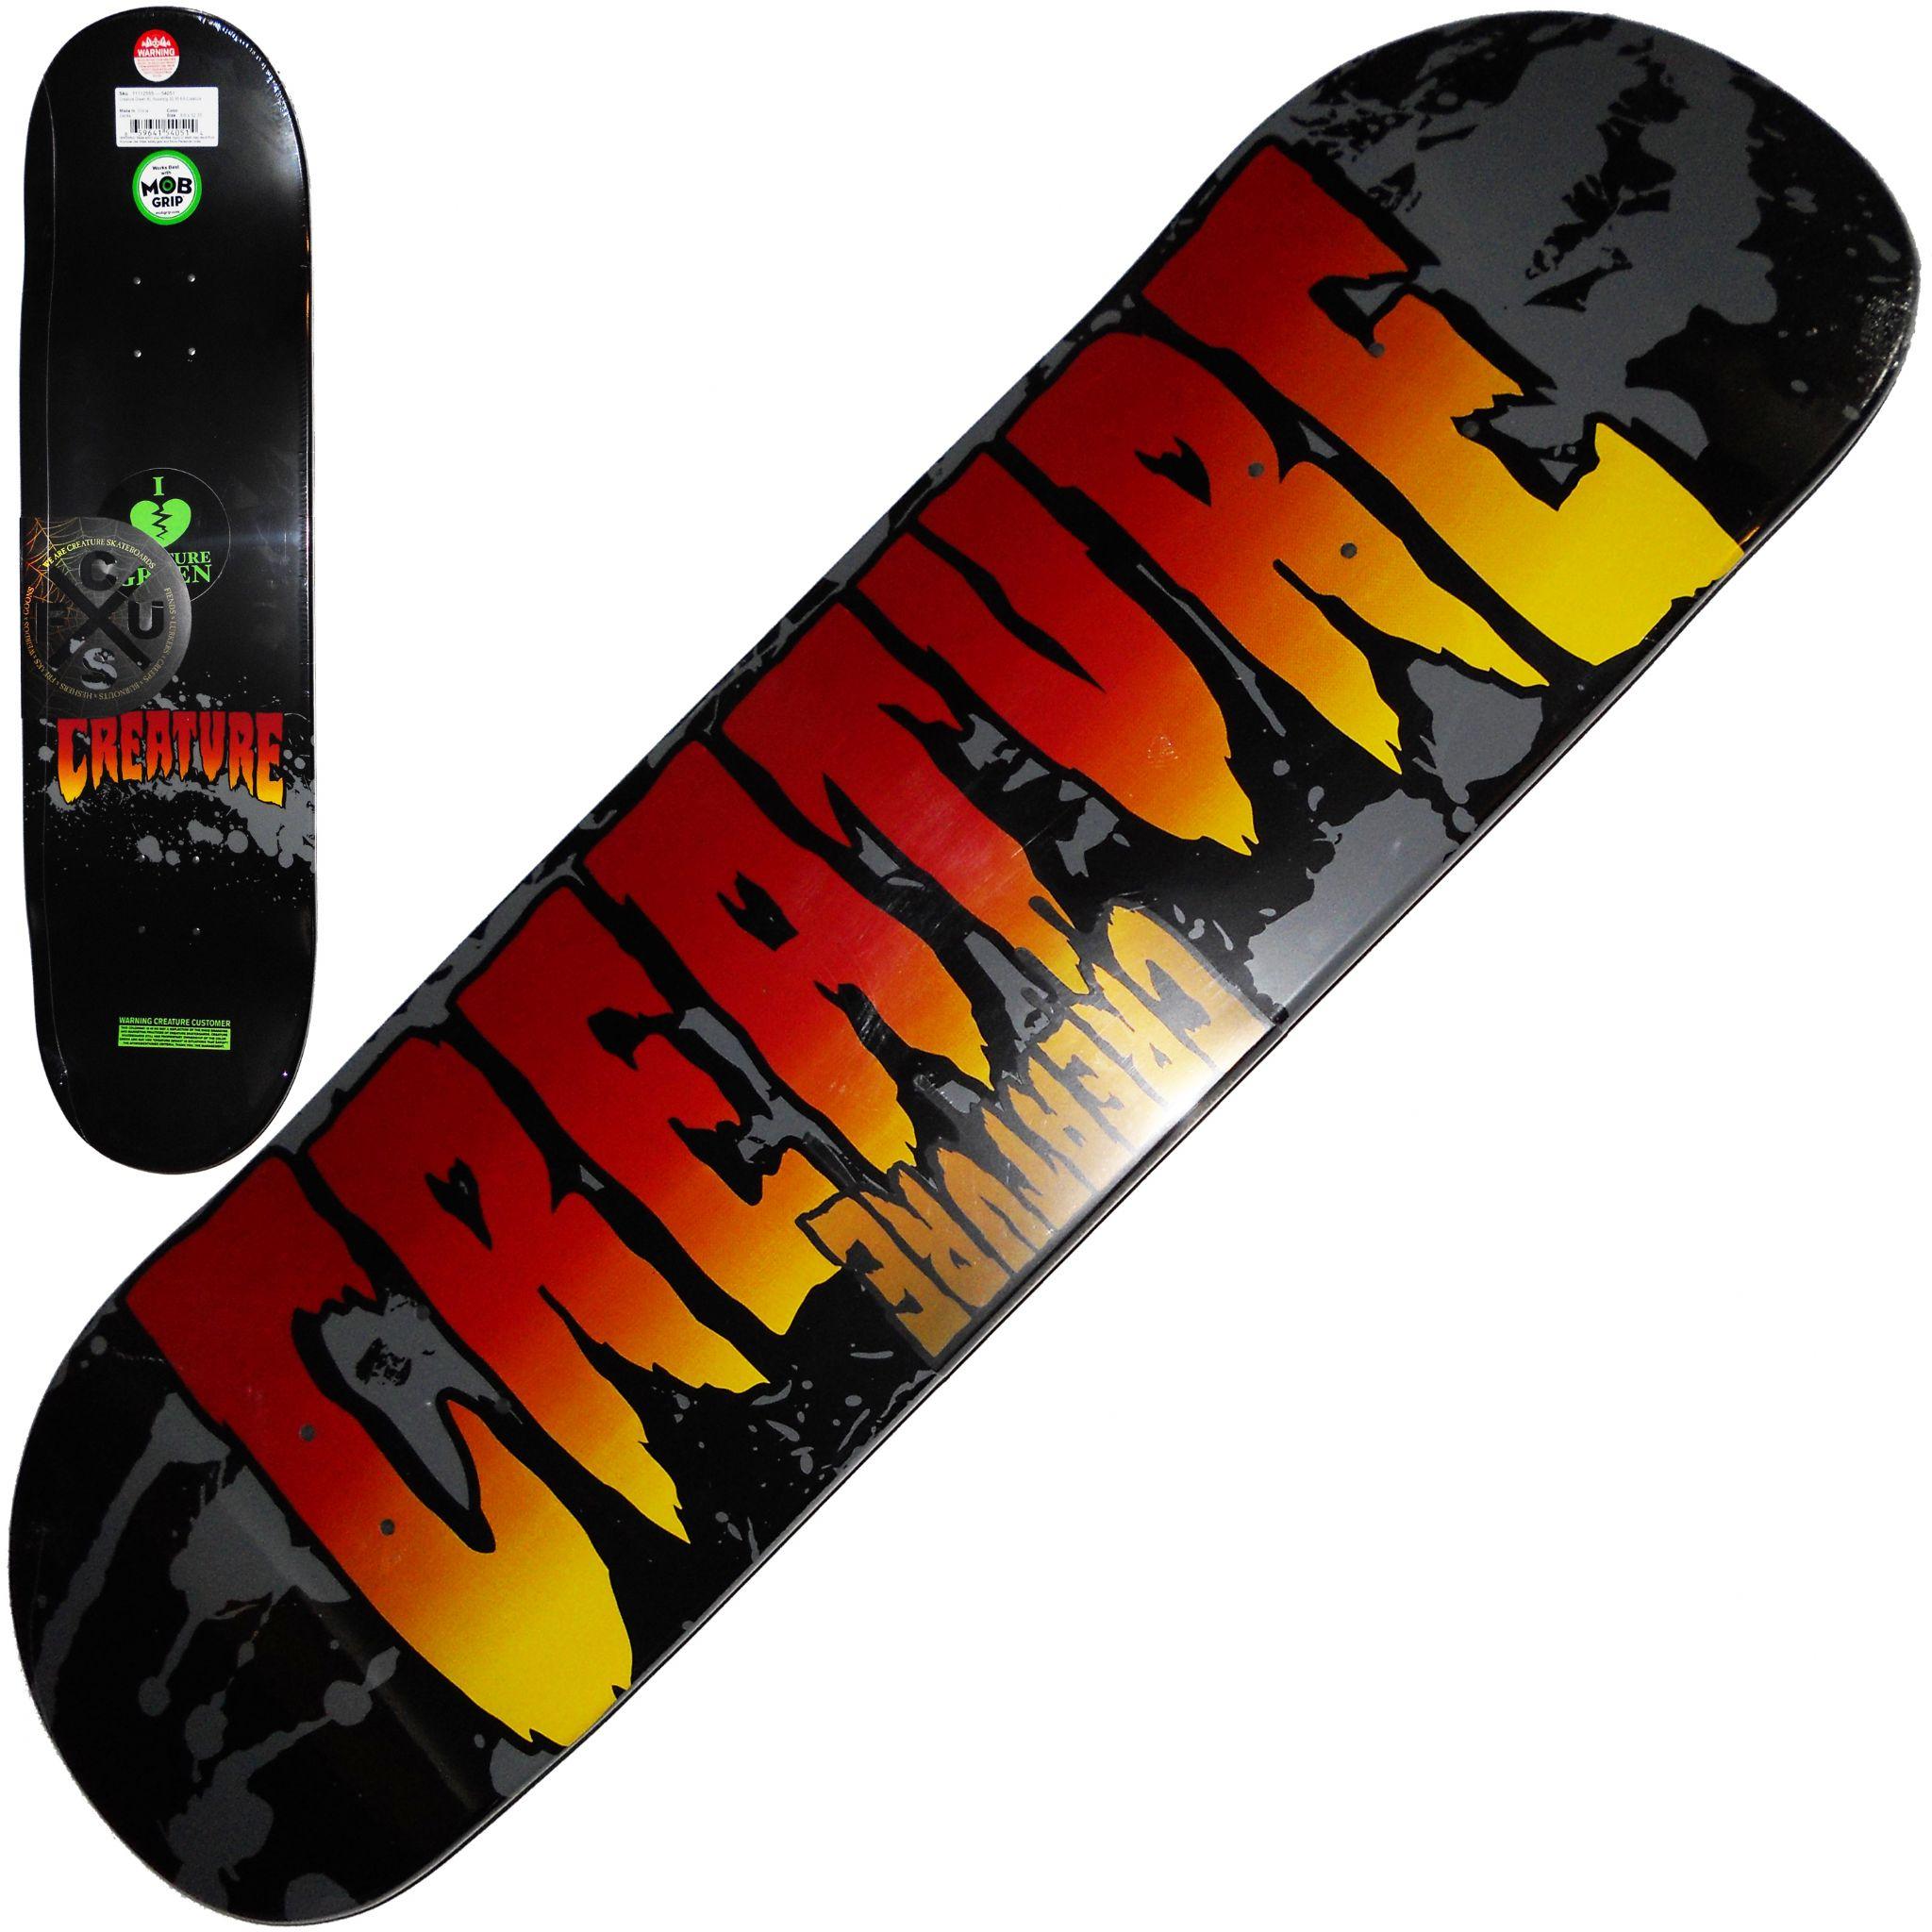 ec58b3f723 Skateboards inc Logos